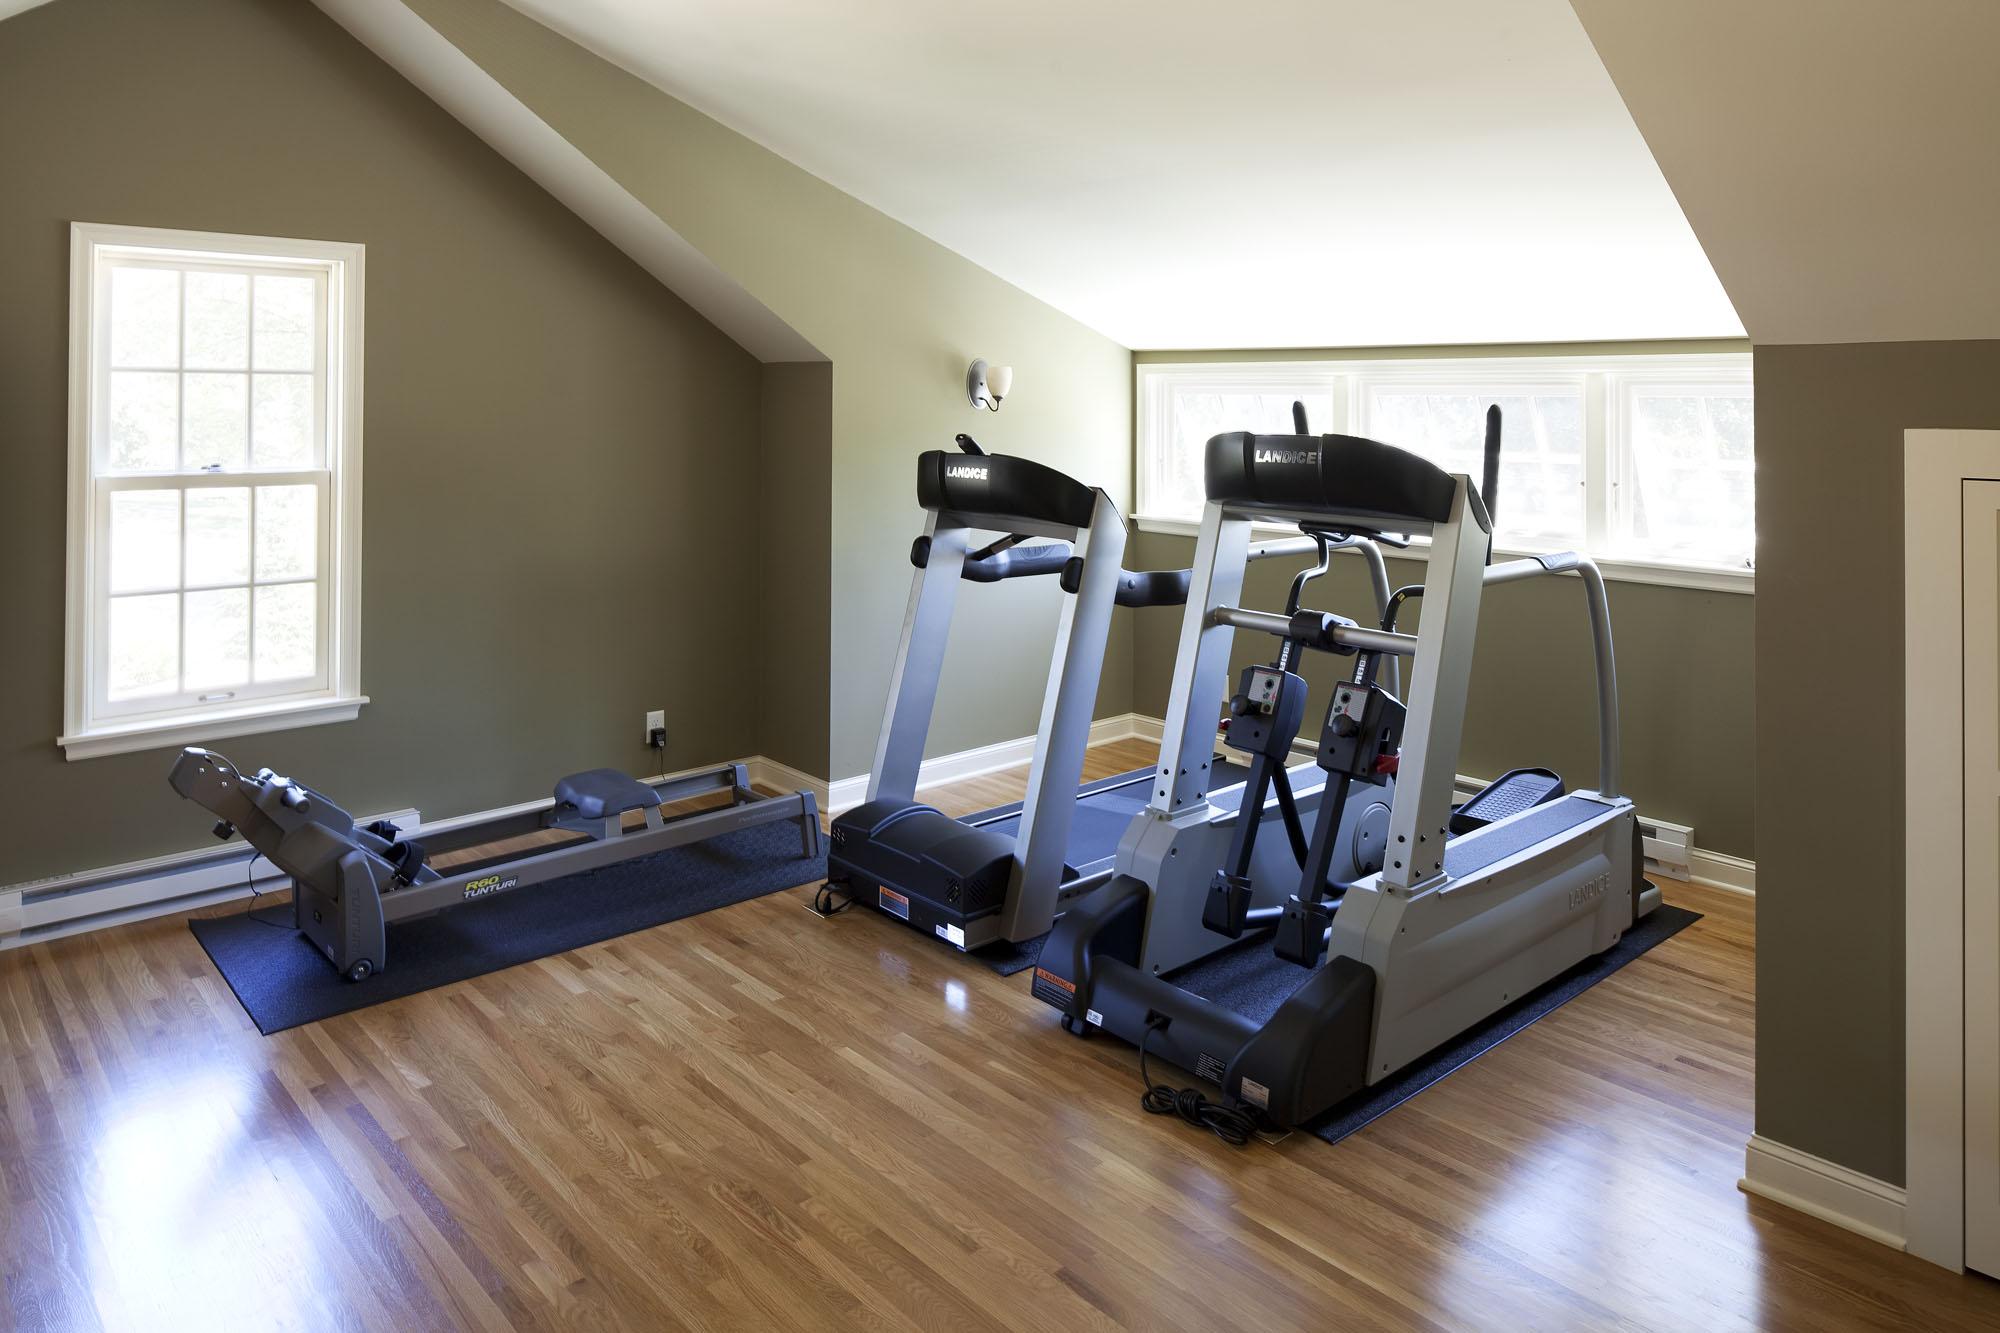 Interior shot with treadmills